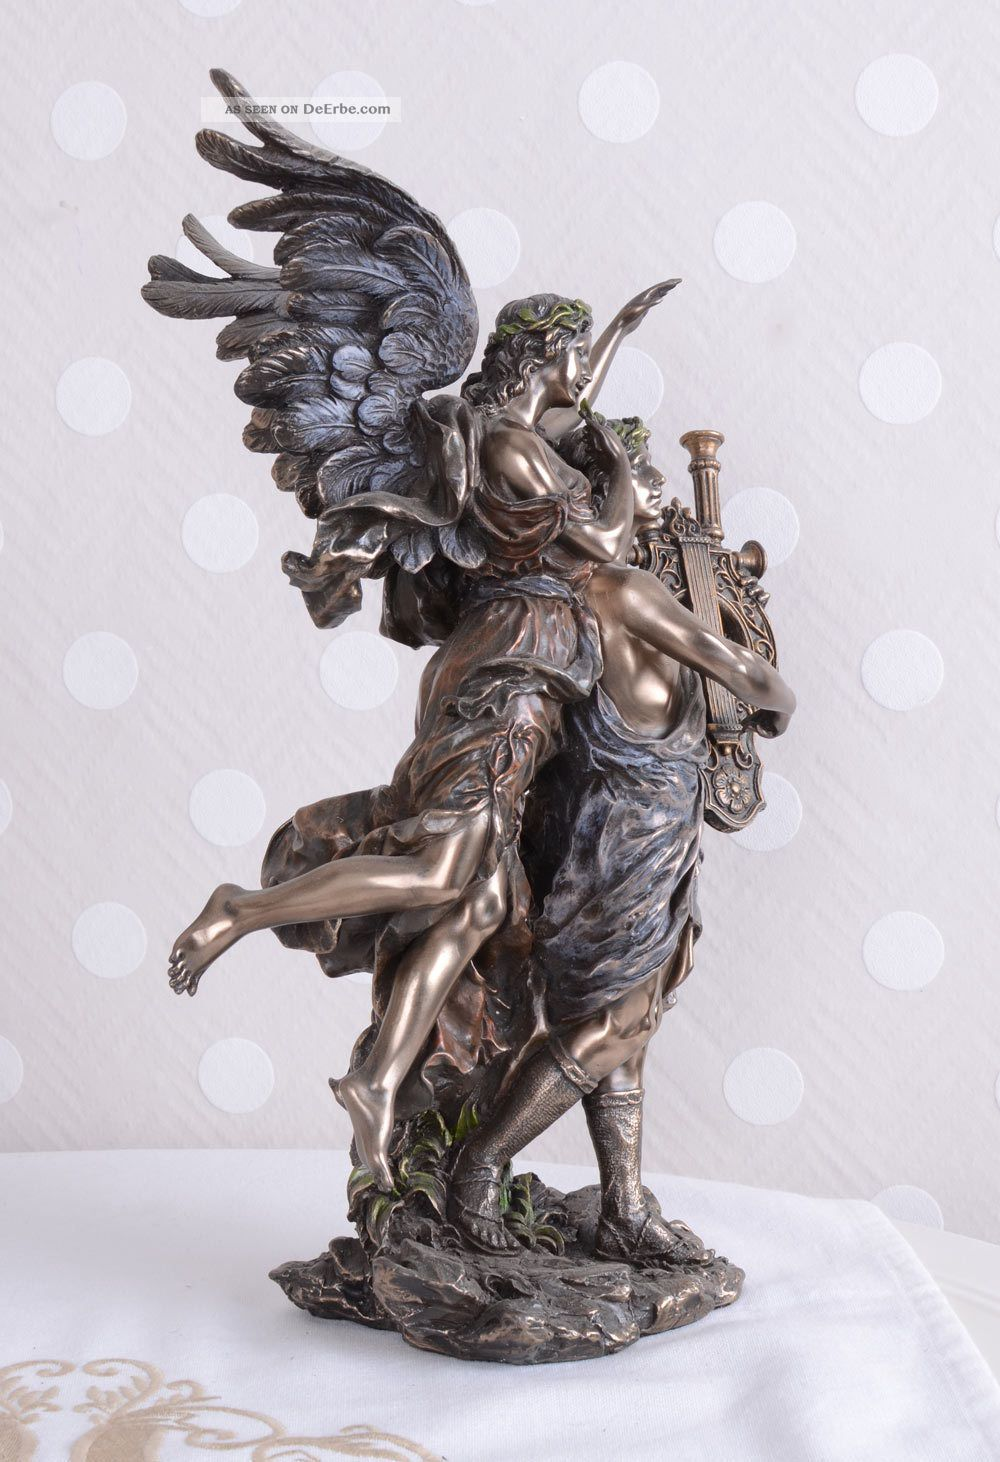 Skulptur Gott Apollon Antike Veronese Einzelstück Antike Bild